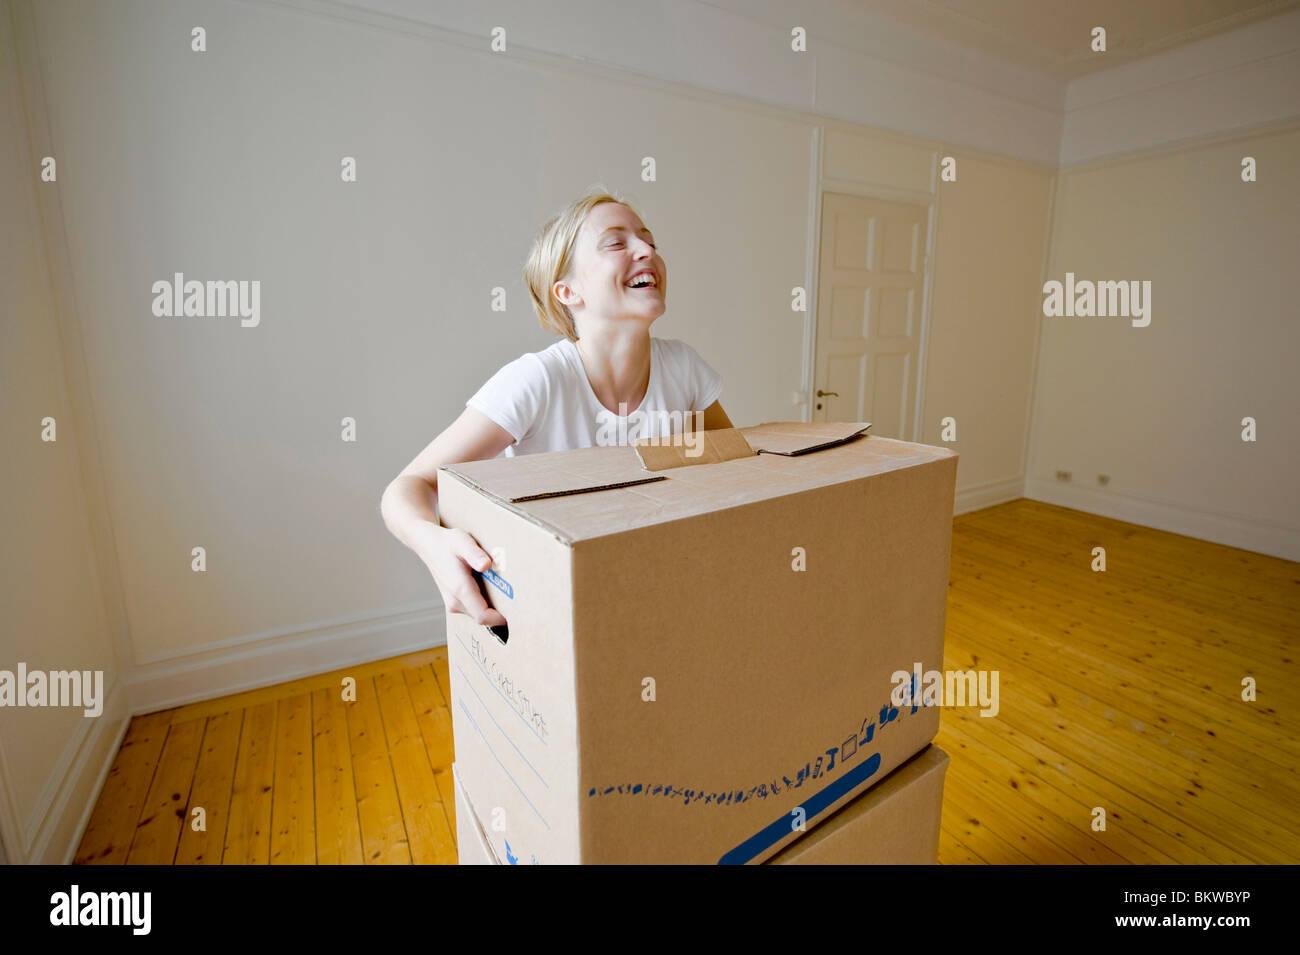 Woman lifting moving box - Stock Image